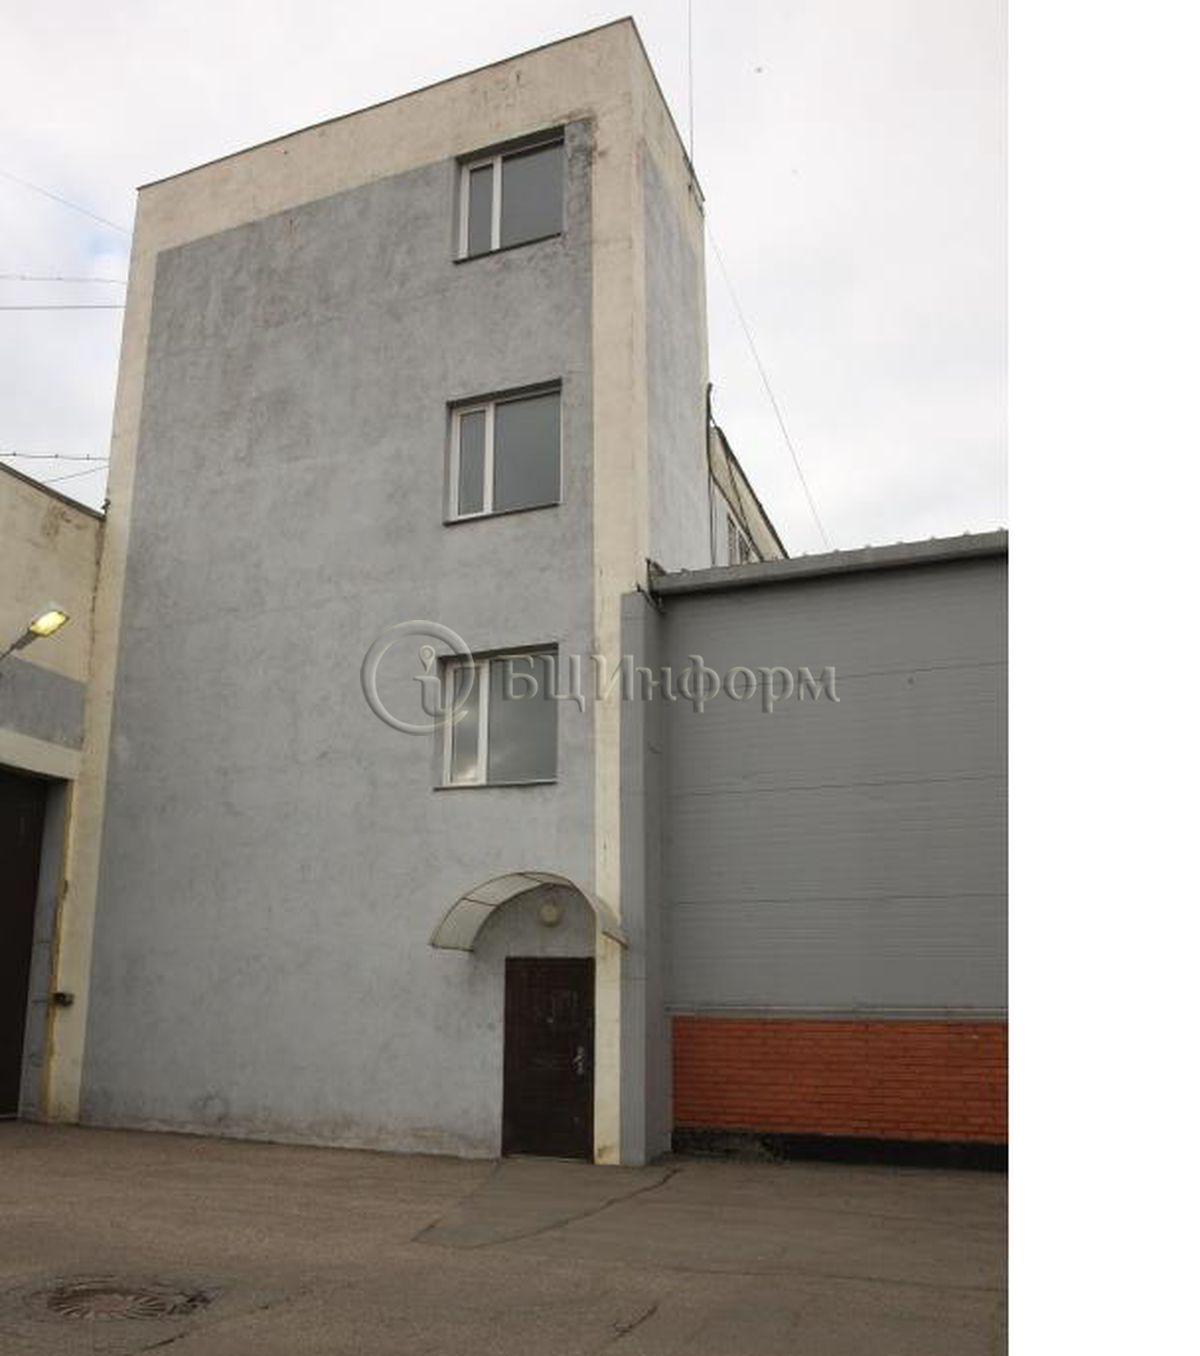 Бизнес-центр Молодогвардейская 61 с20 - Фасад